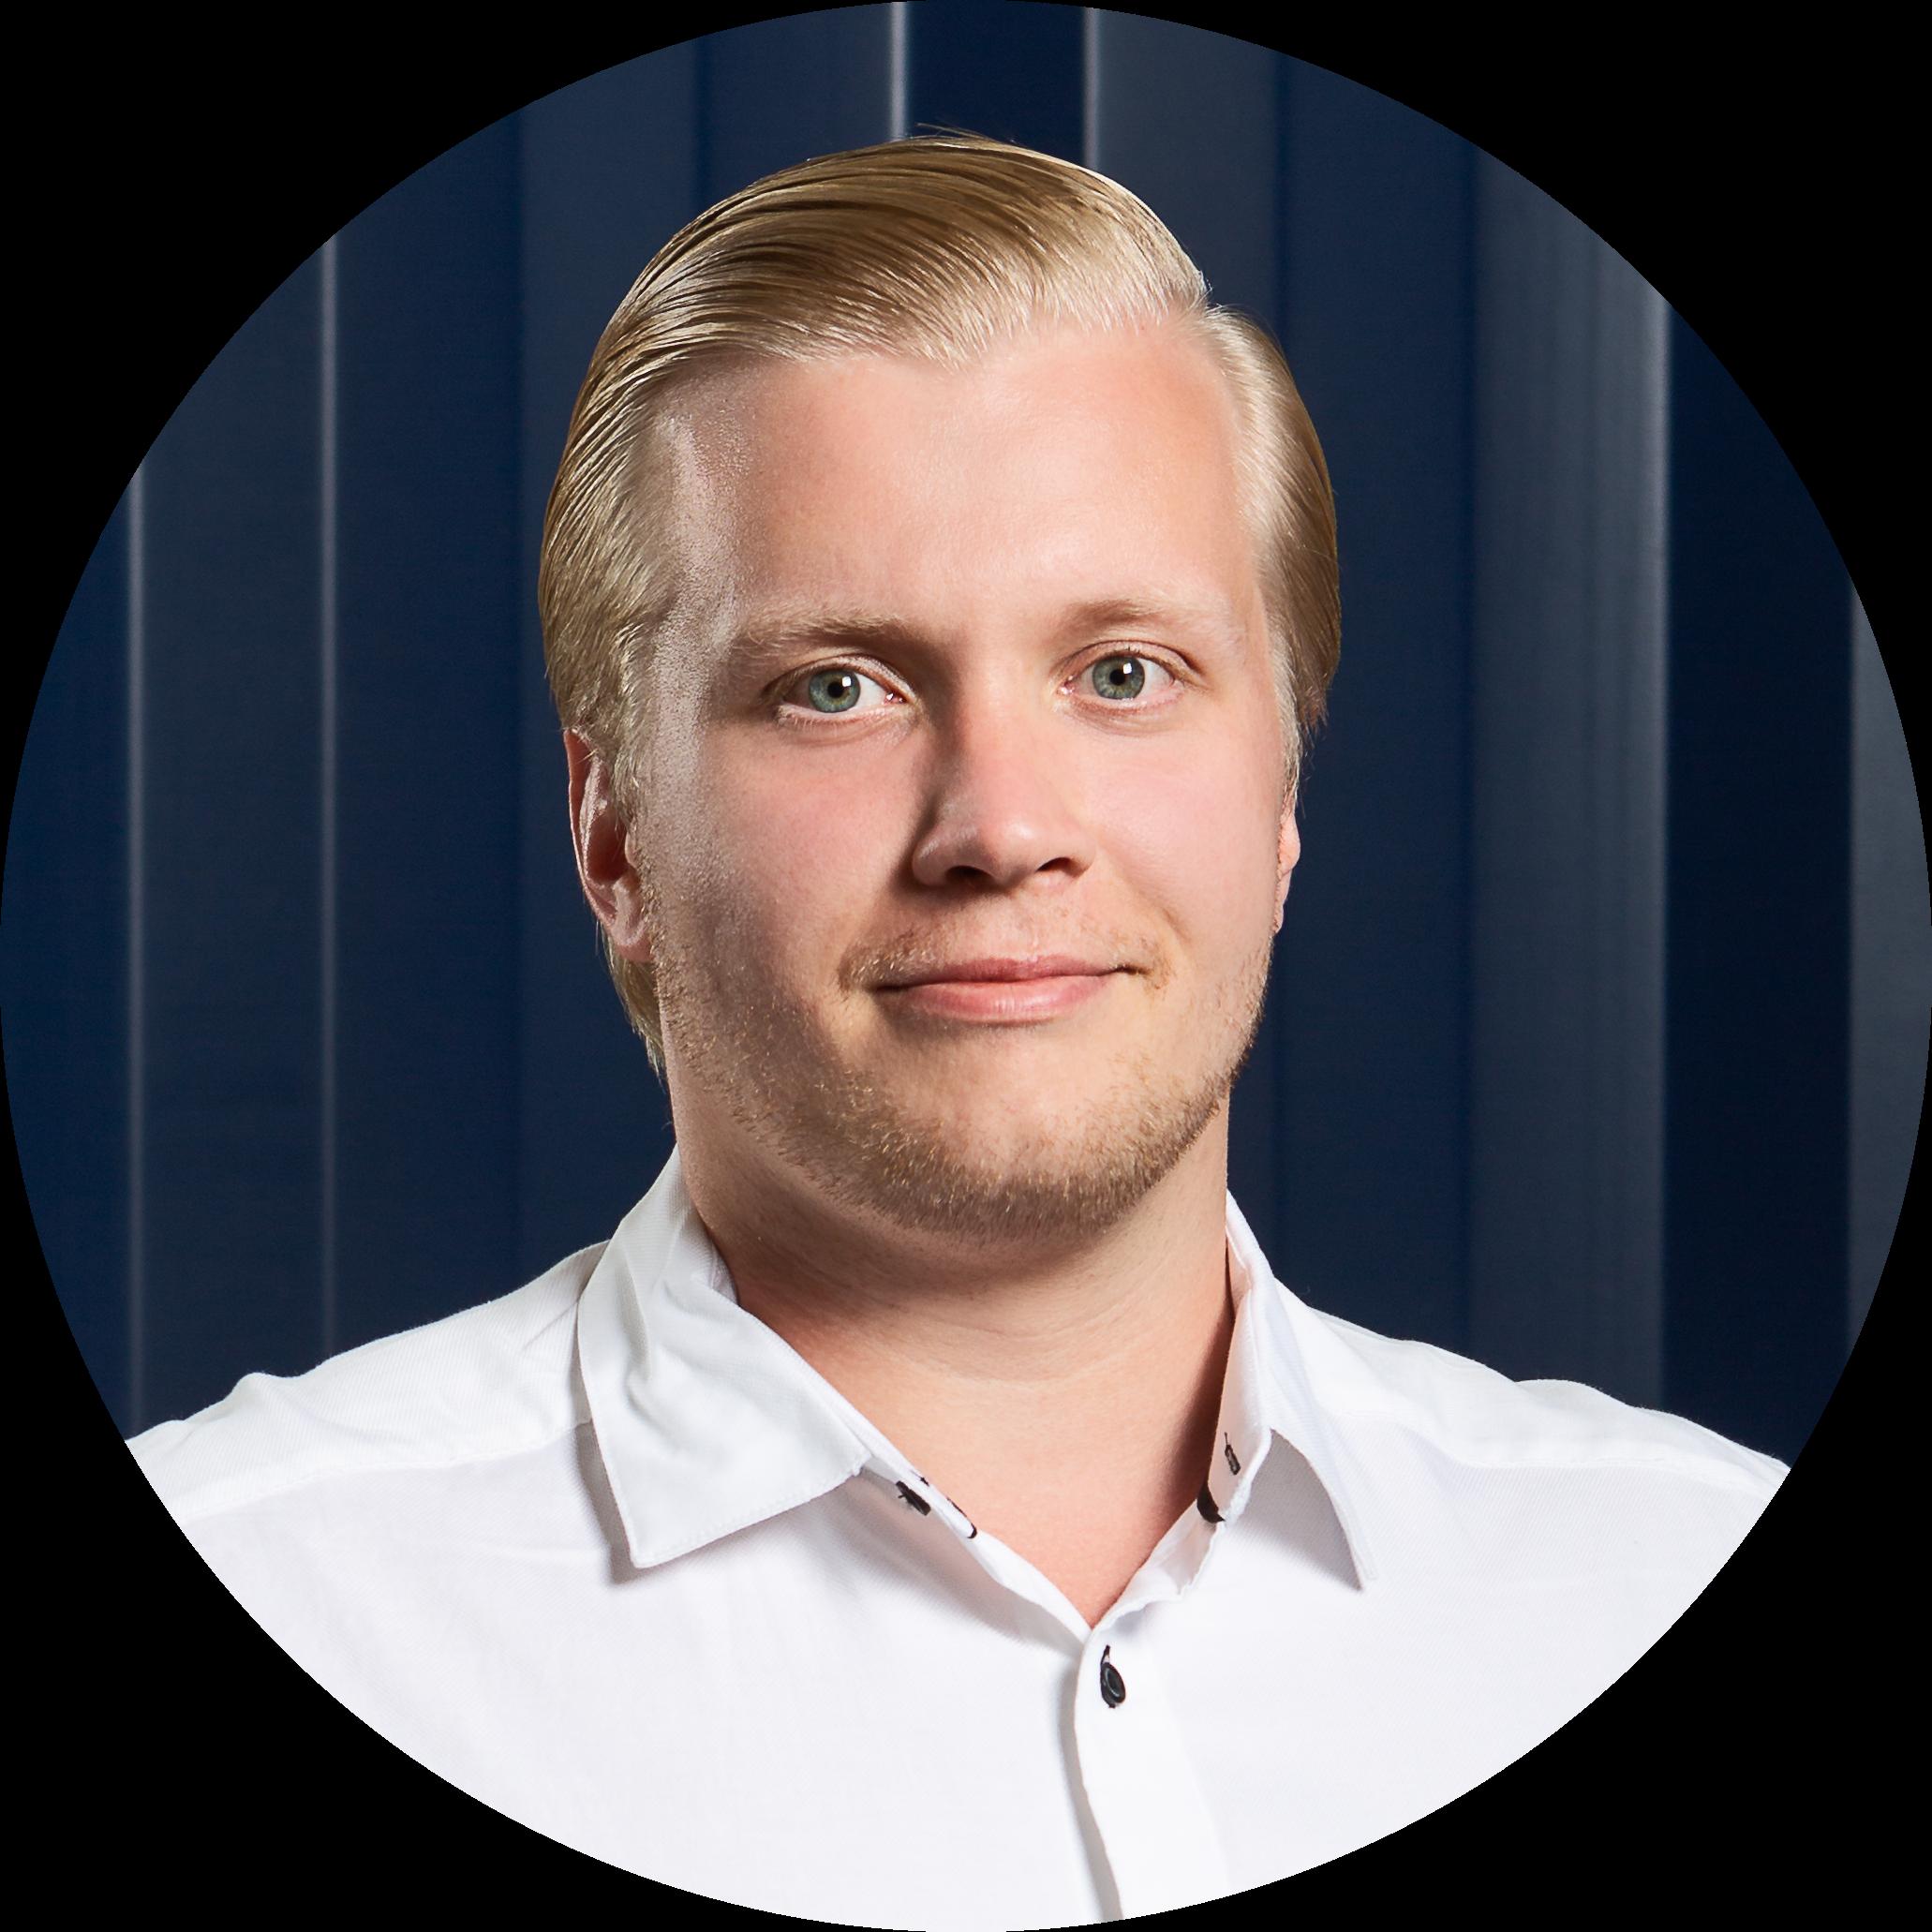 Juha Halmesmäki